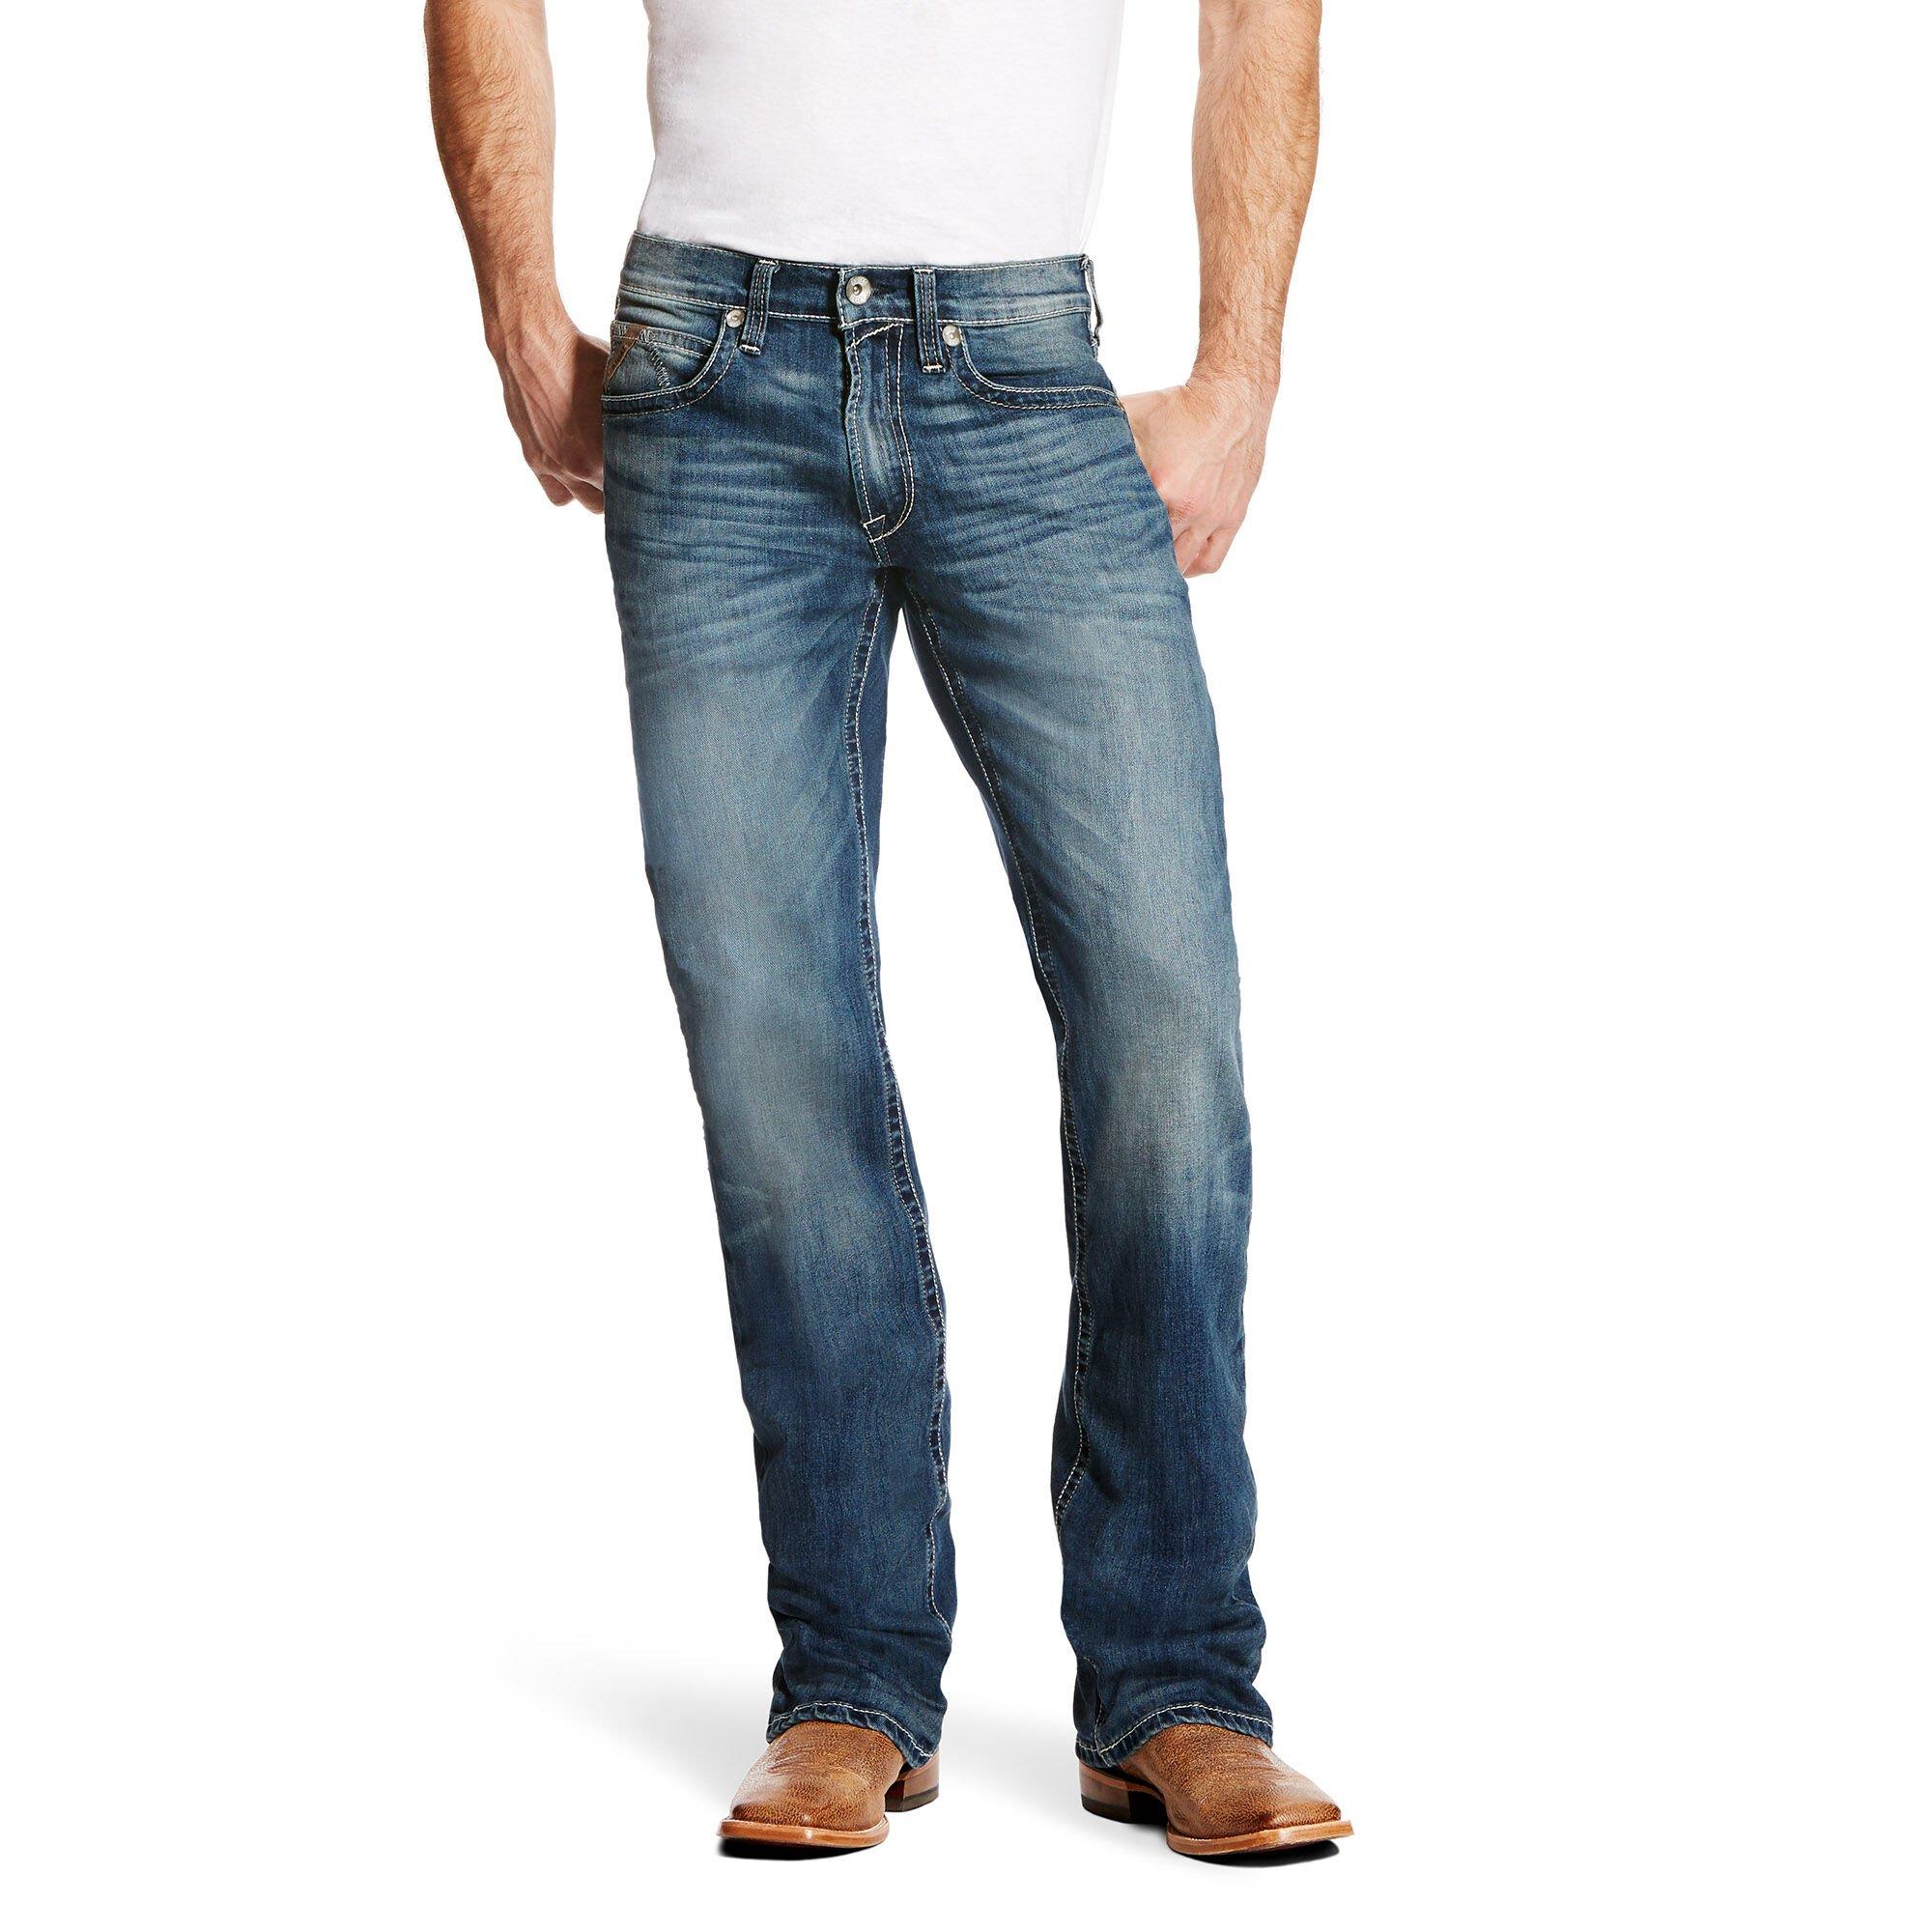 M5 Slim Maxwell Stretch Cooling Boot Cut Jean